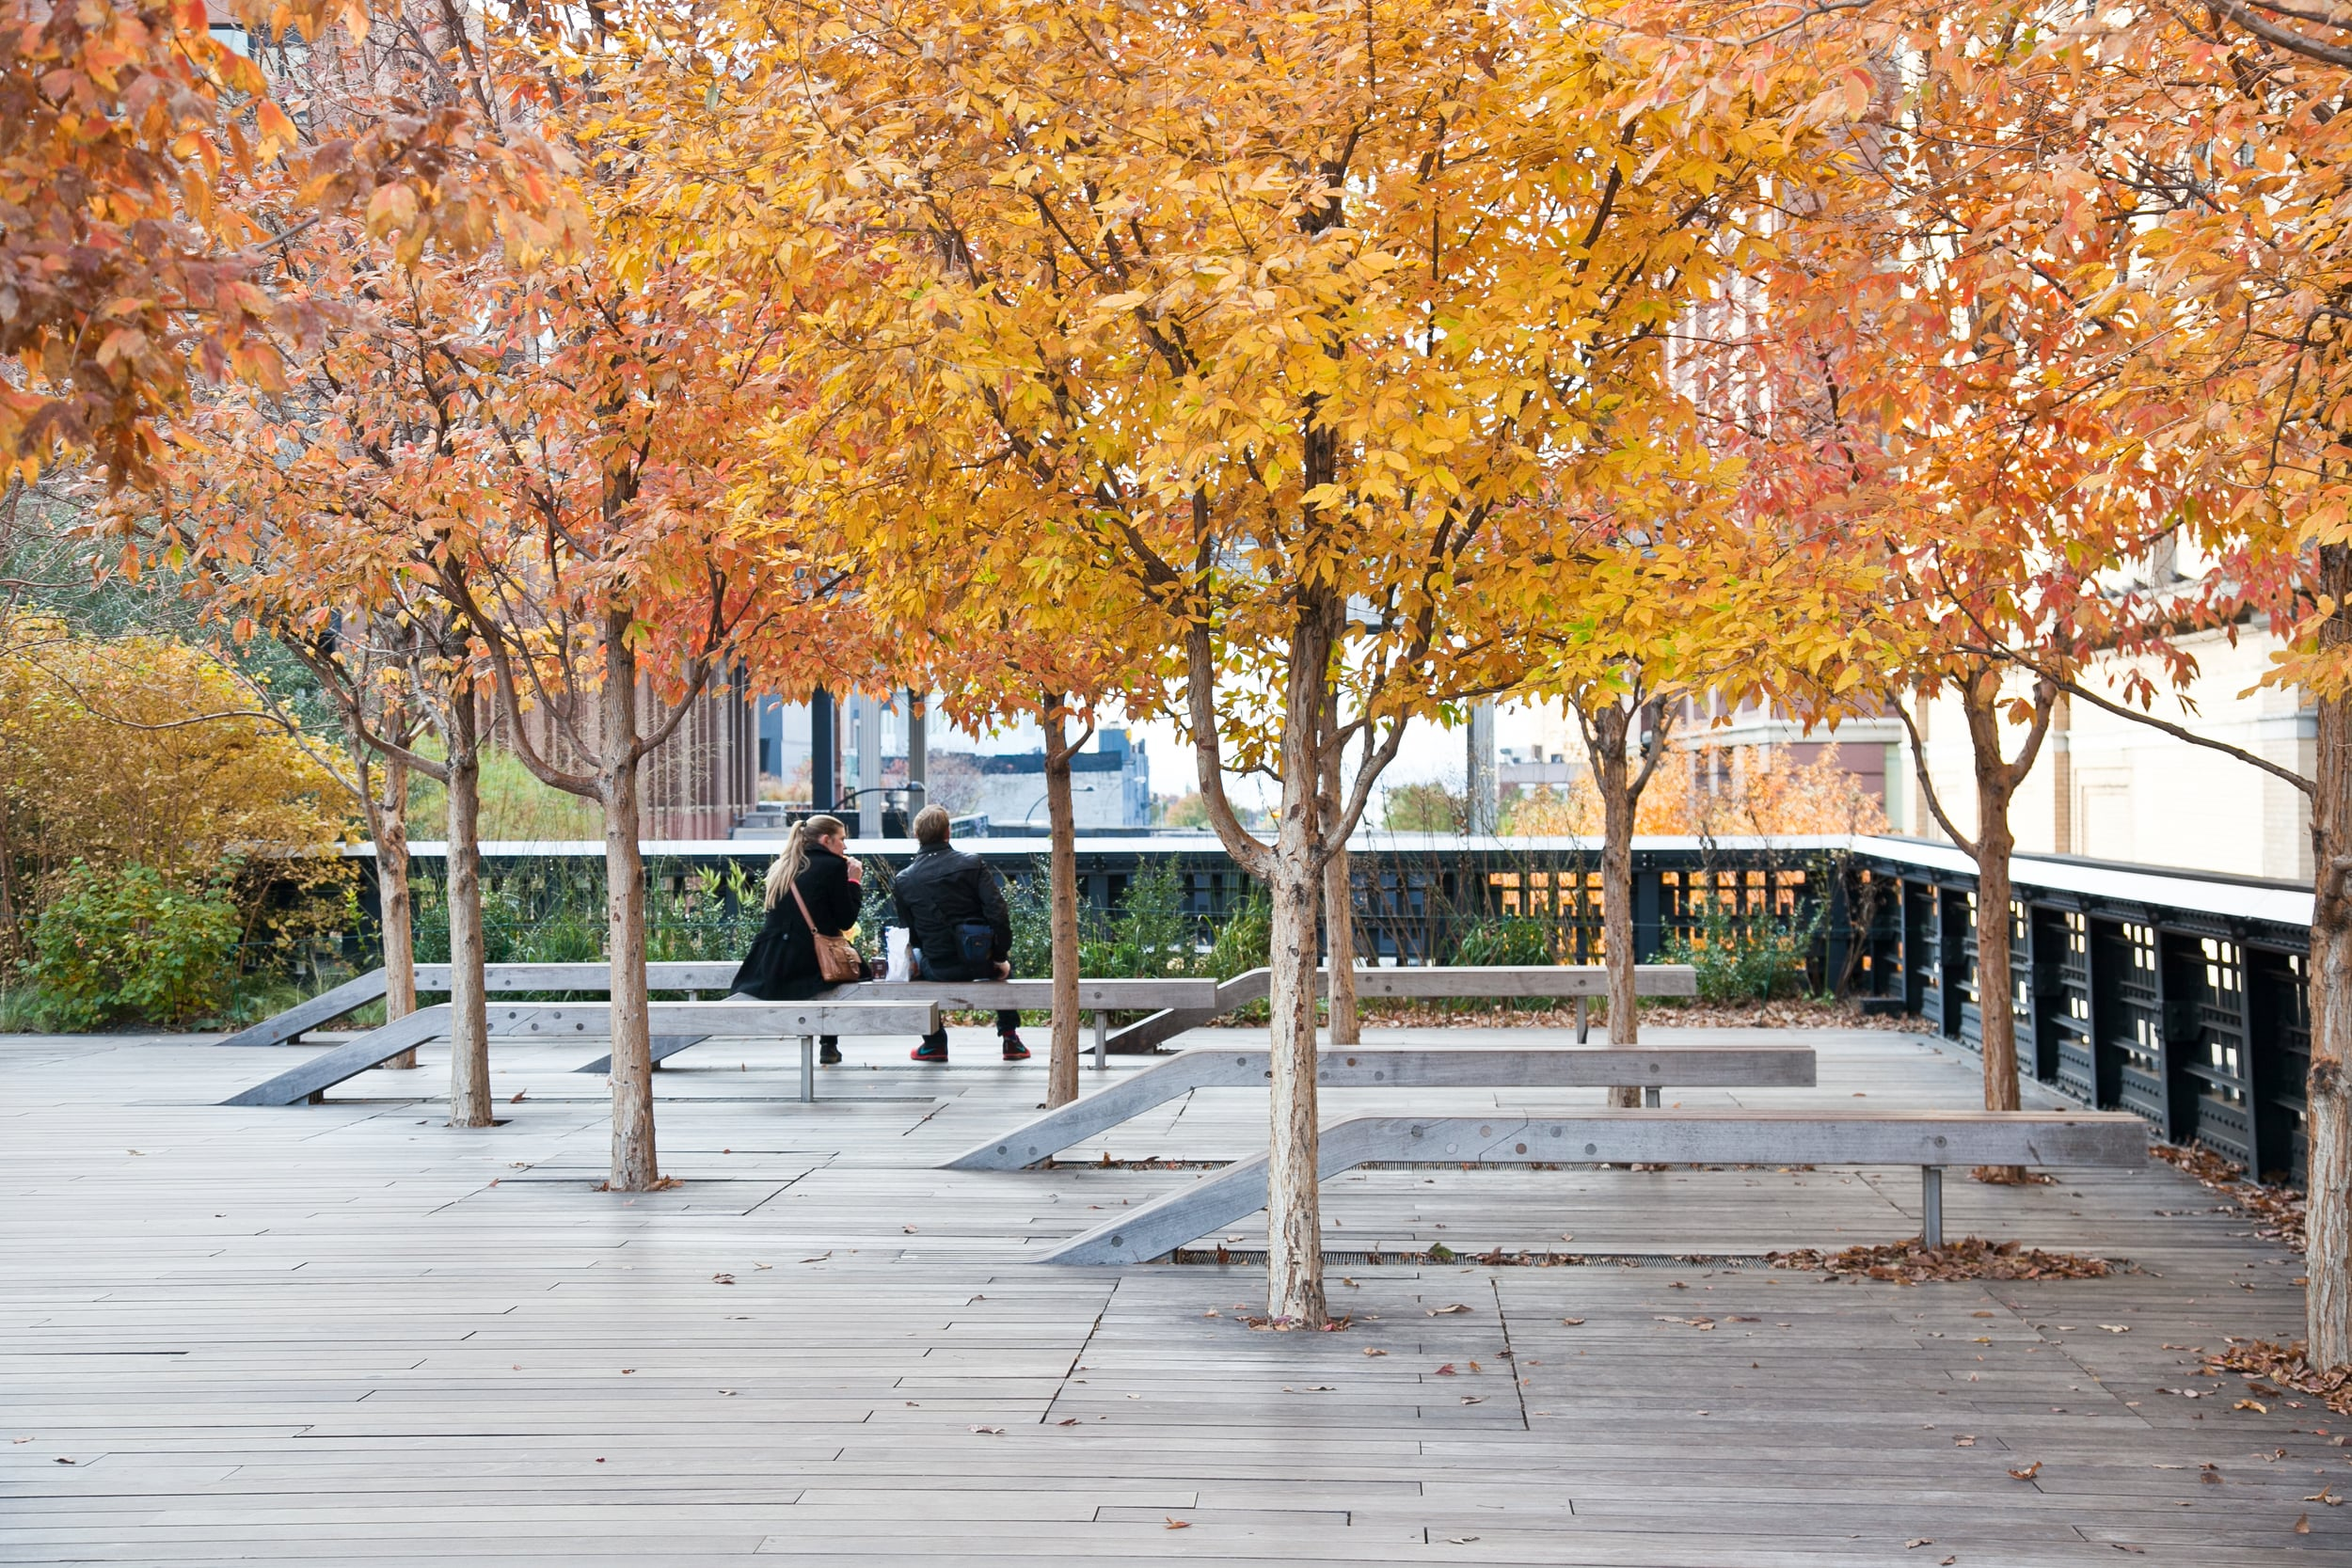 trisa-taro-high line-fall-trees-new york city.jpg